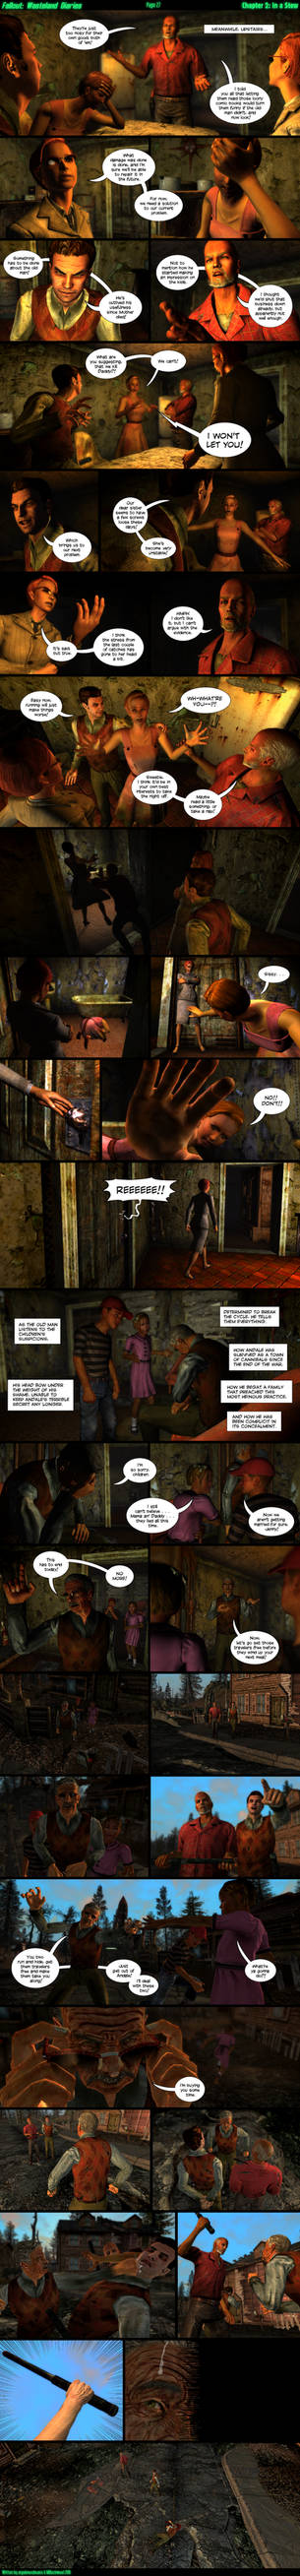 Wasteland Diaries - Page 27